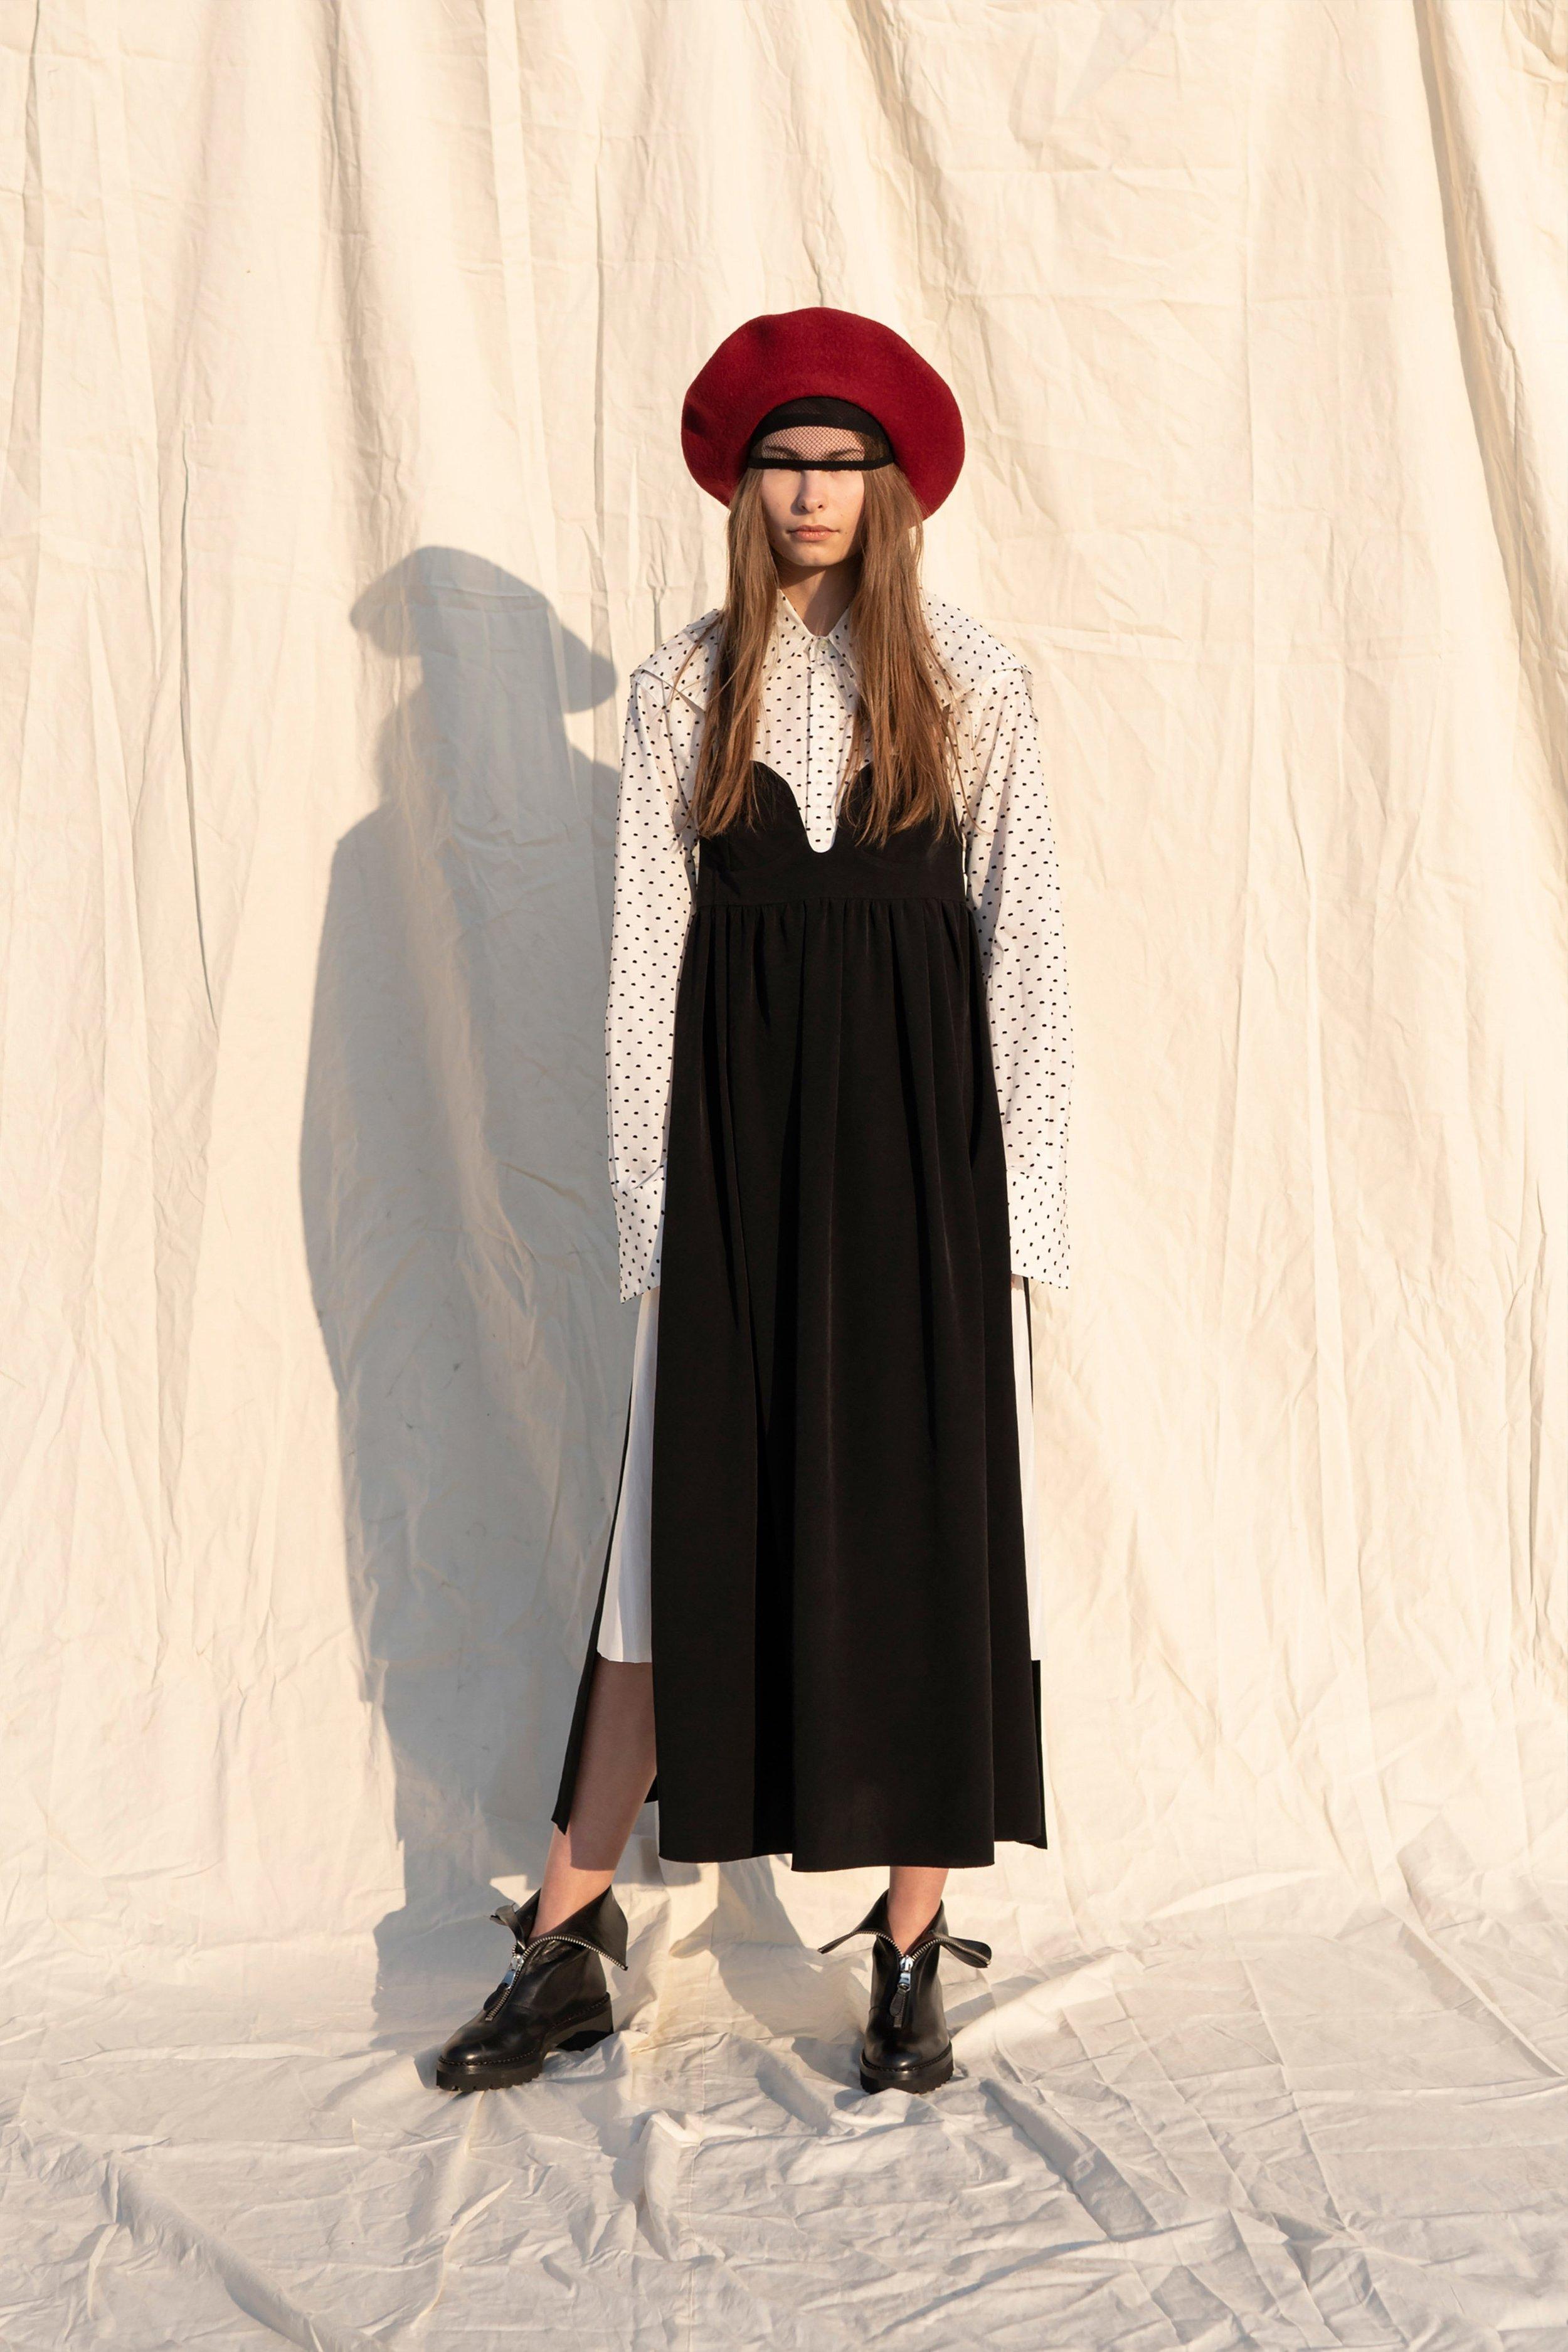 00052-Ys-Yohji-Yamamoto-FALL-19-Ready-To-Wear.jpg